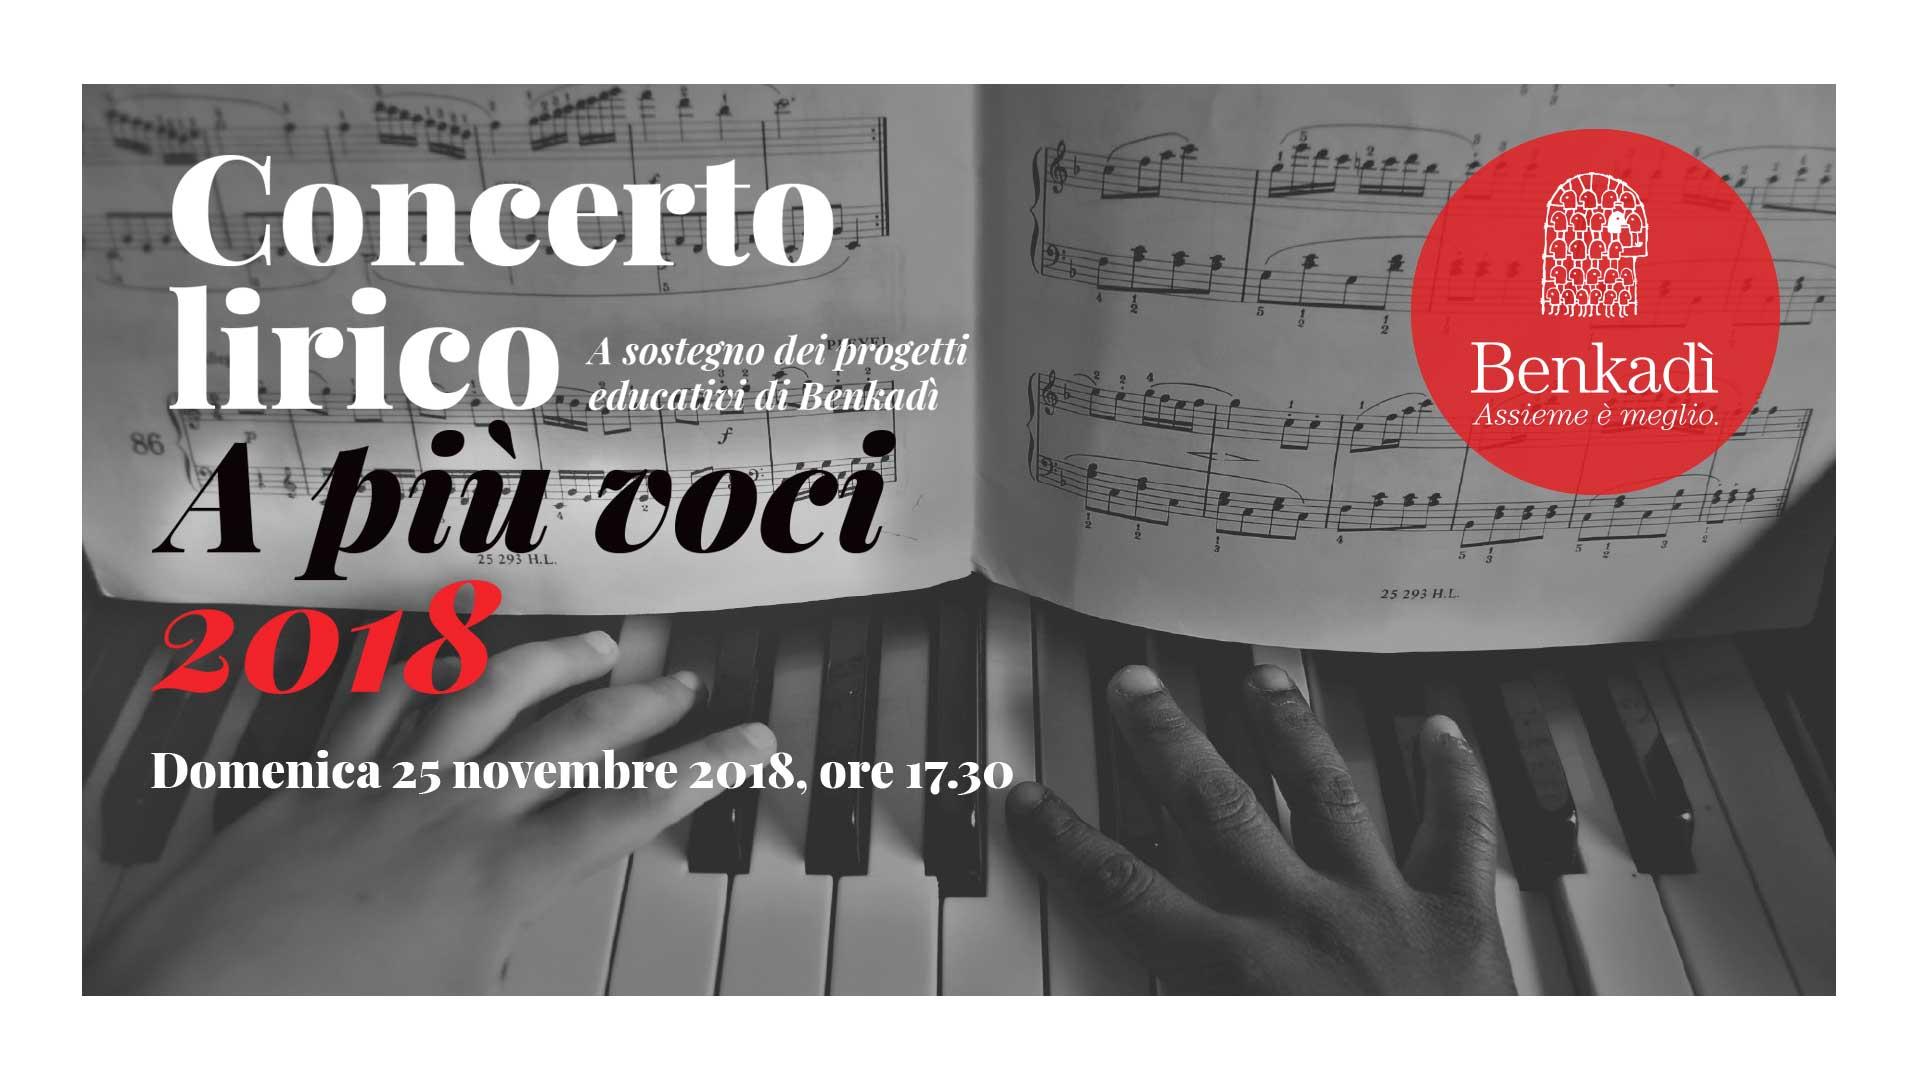 Concerto lirico a più voci 25 novembre